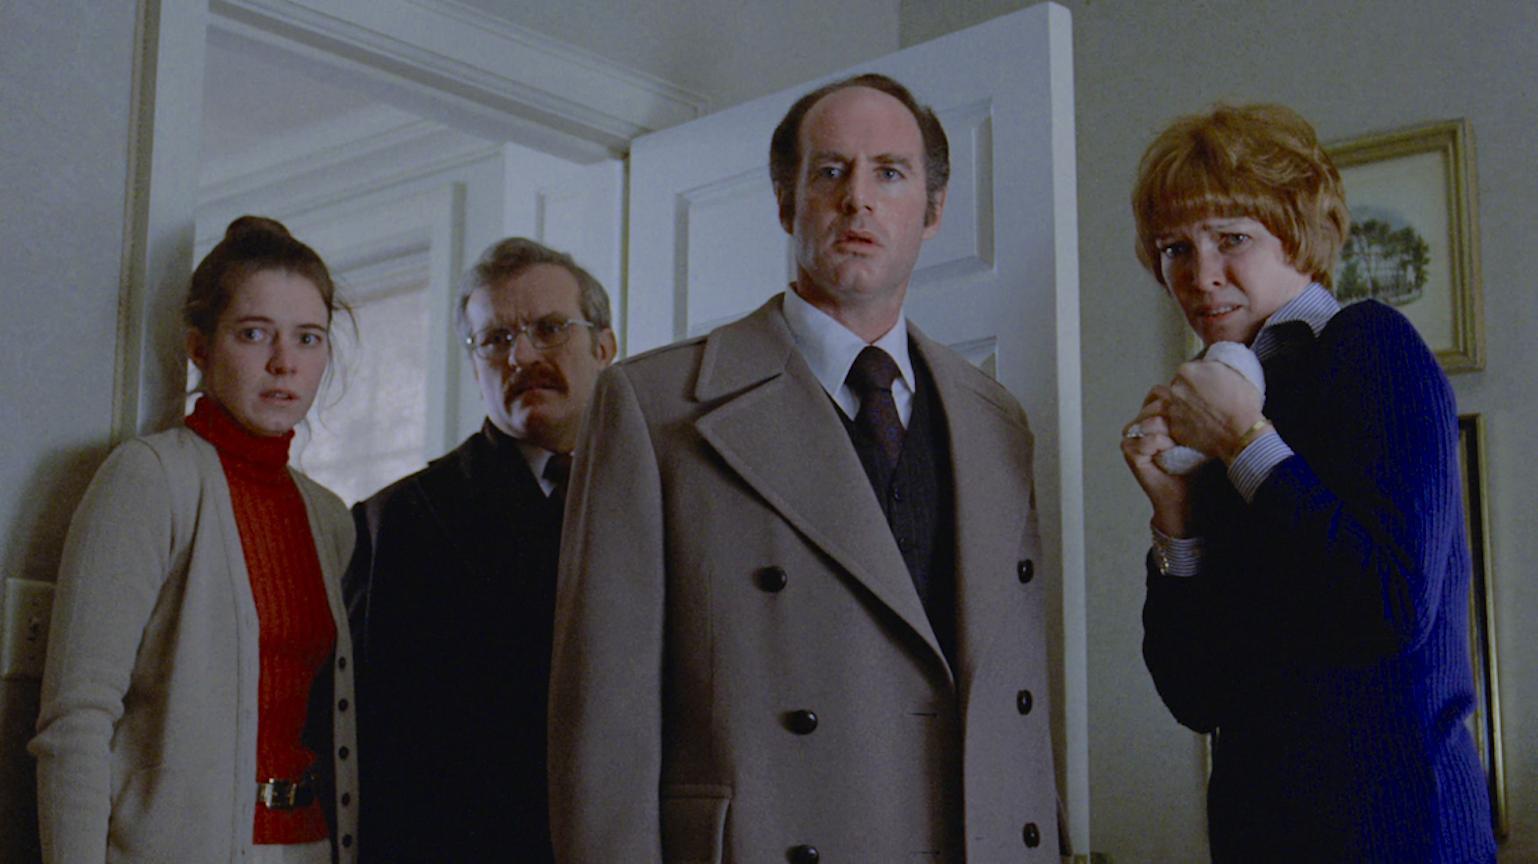 Ellen Burstyn, Barton Heyman, Robert Symonds, and Kitty Winn in The Exorcist (1973)